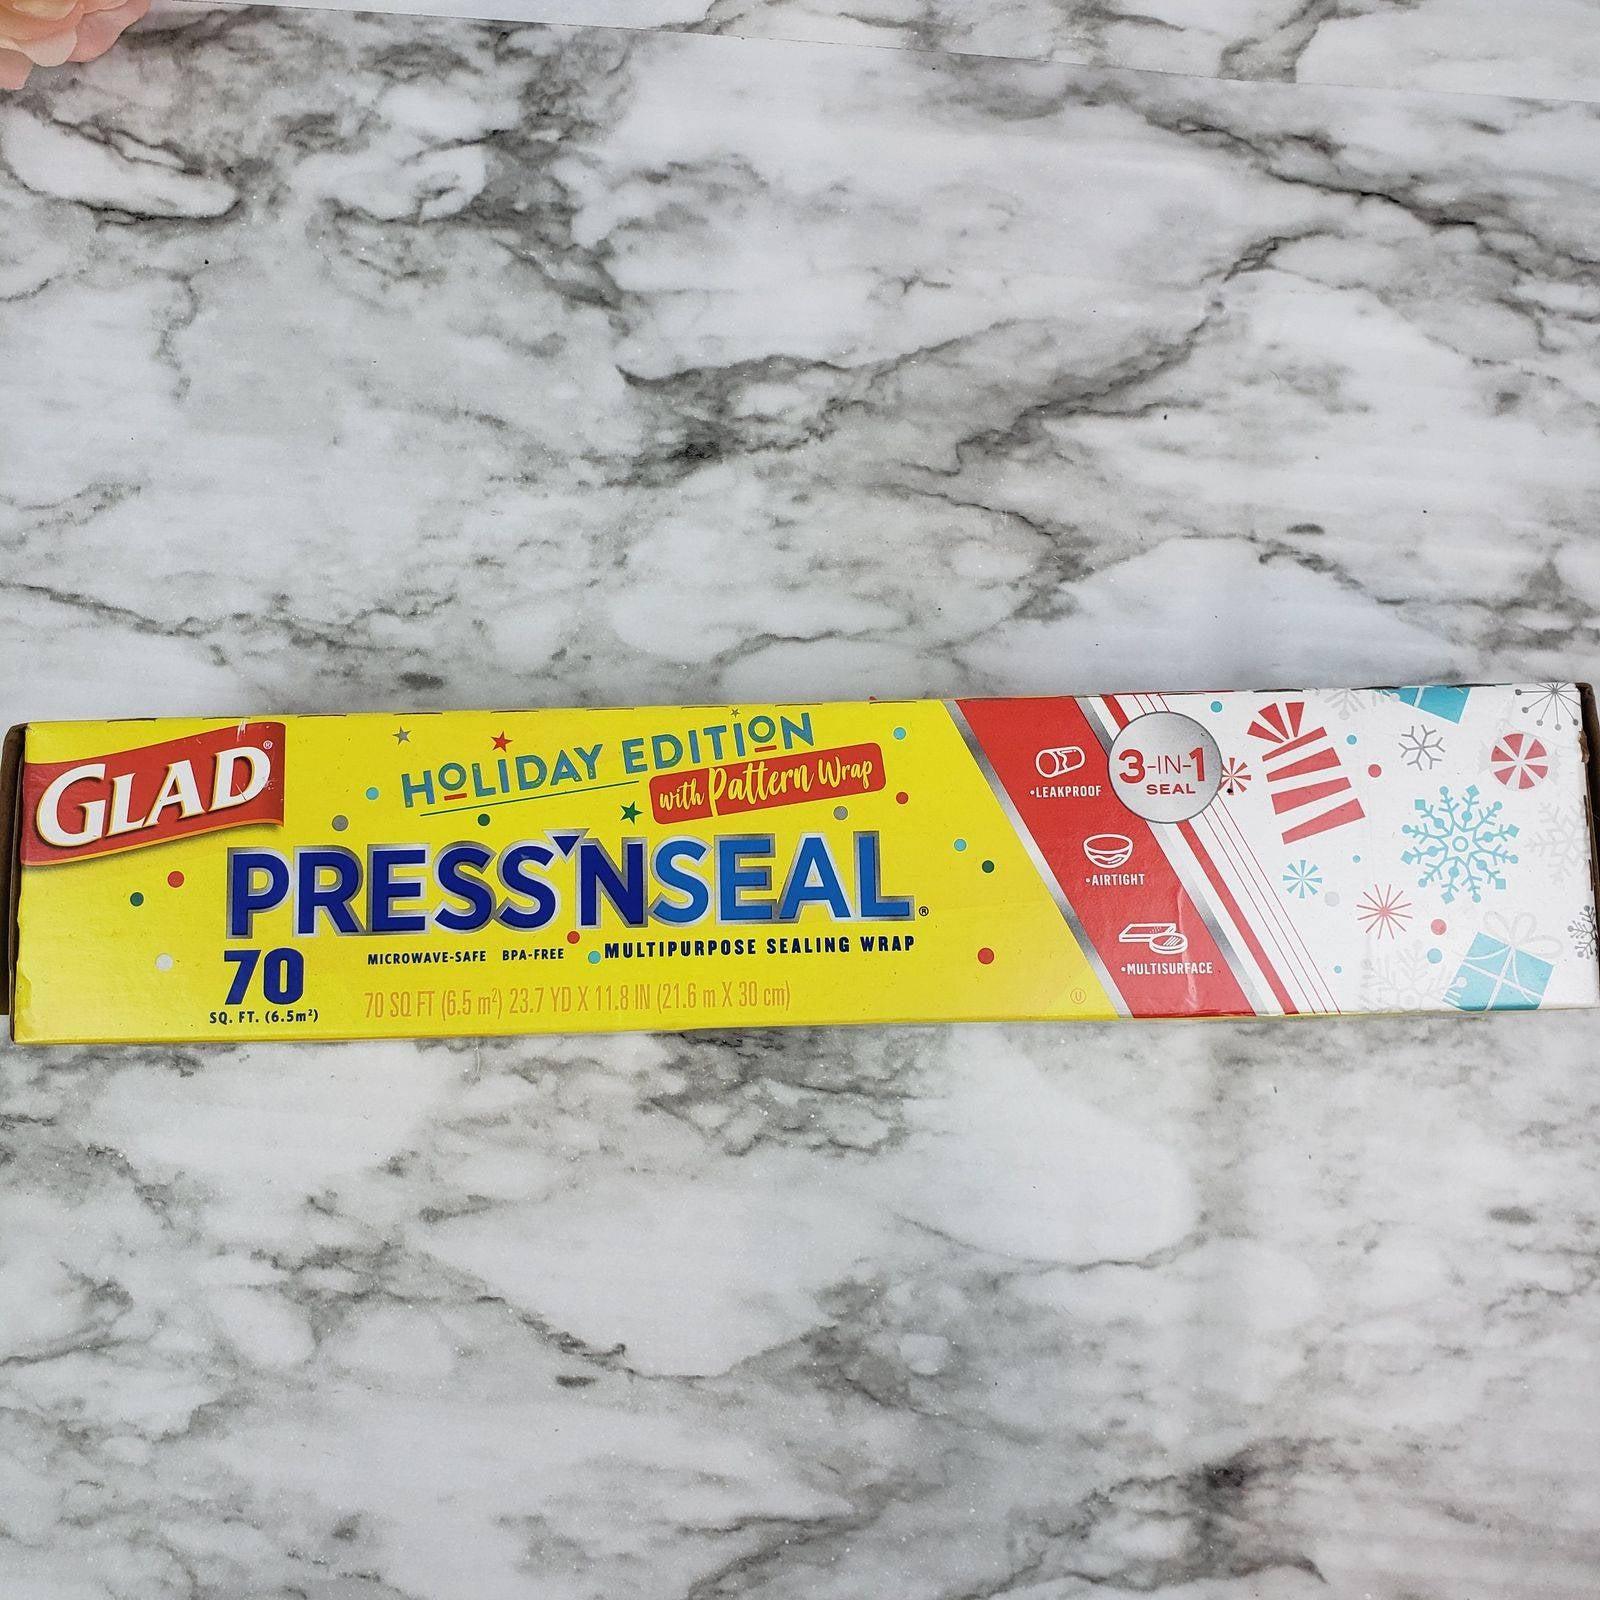 New Glad Press N Seal Holiday Edition